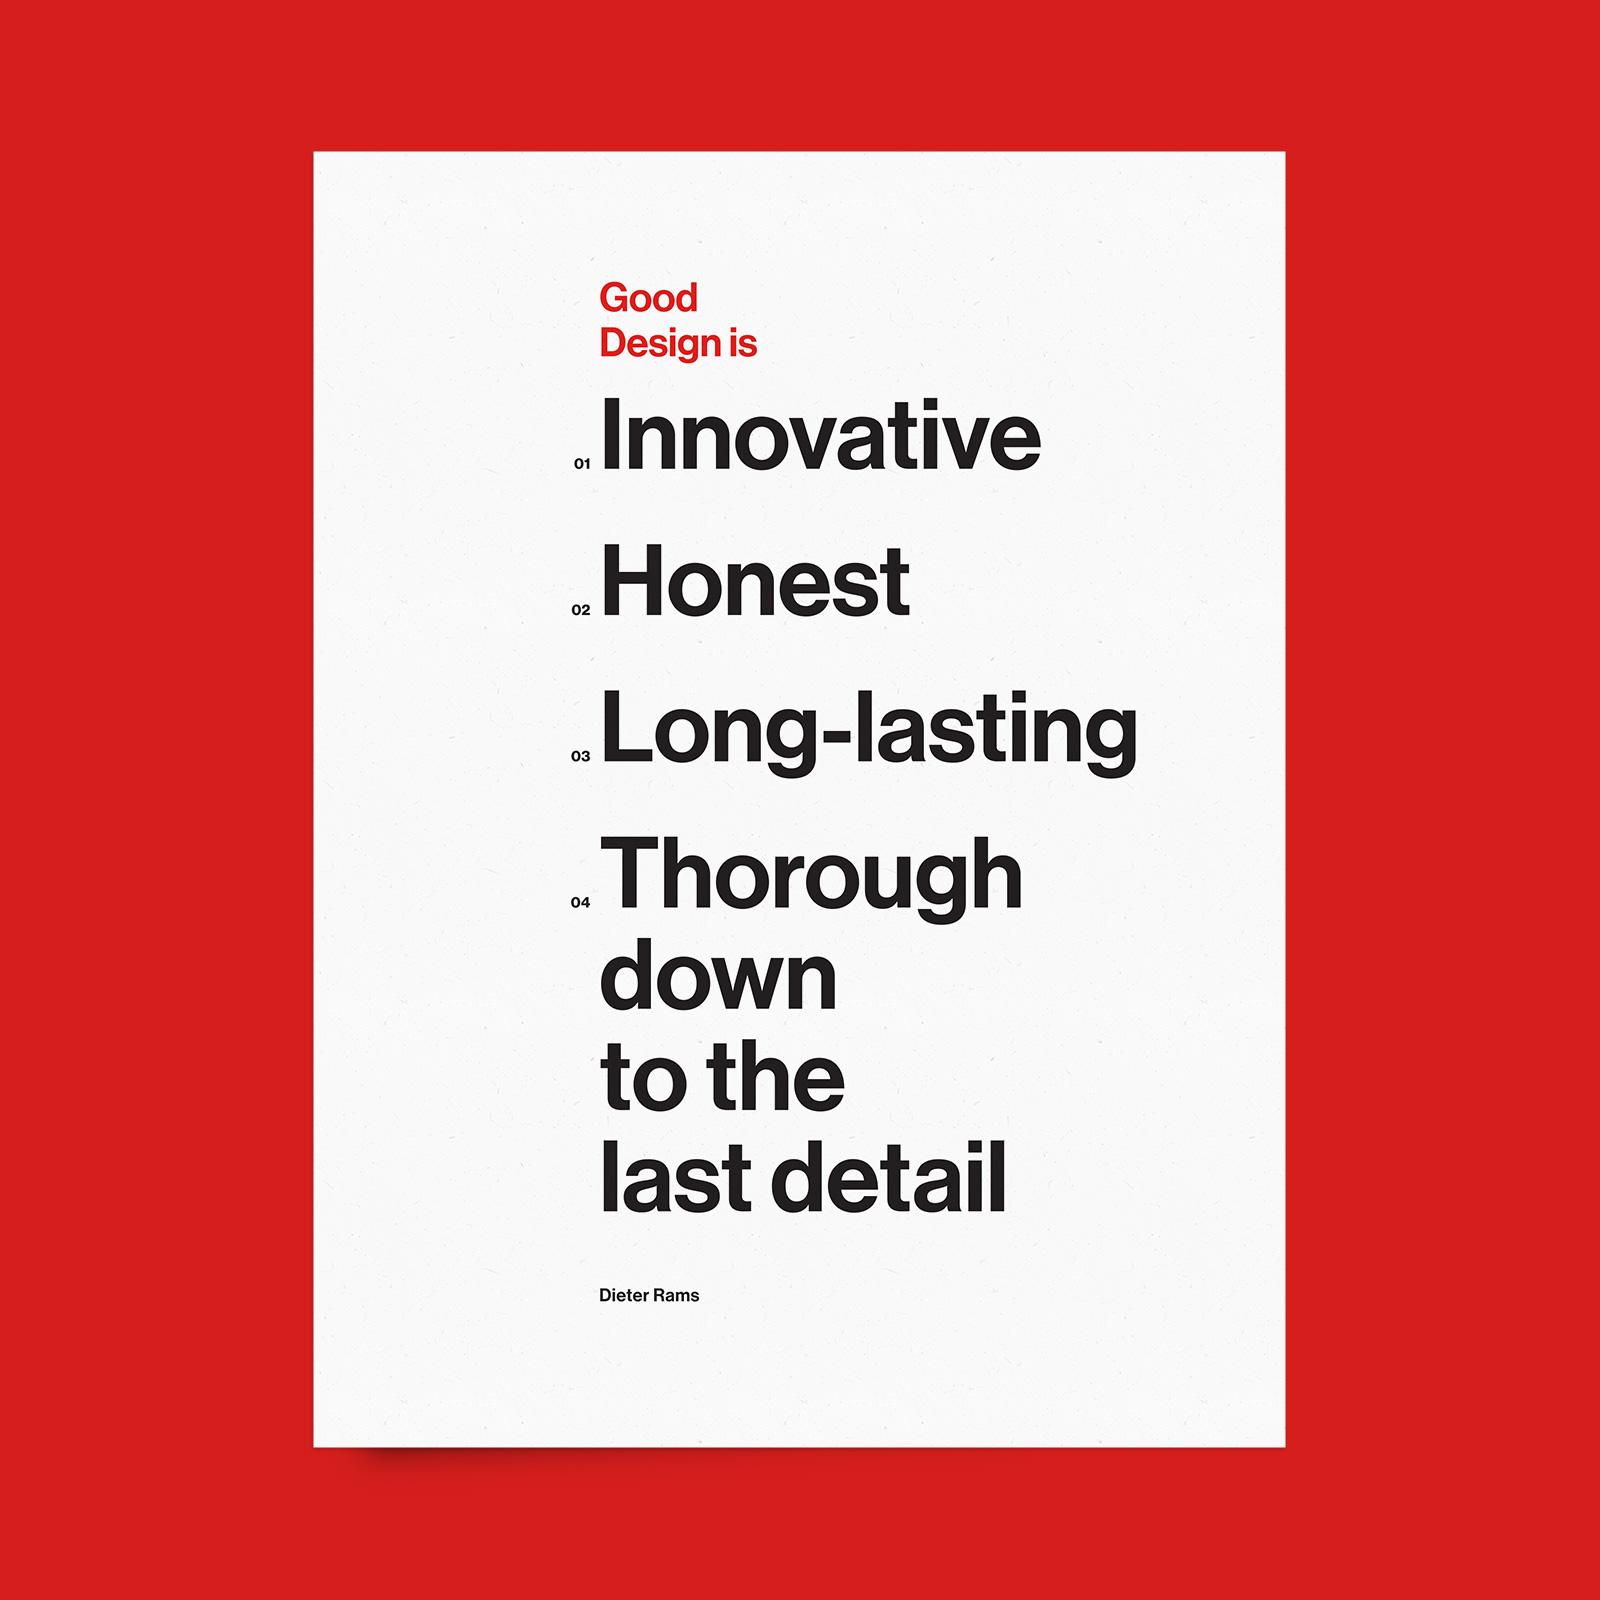 Good Design Is...